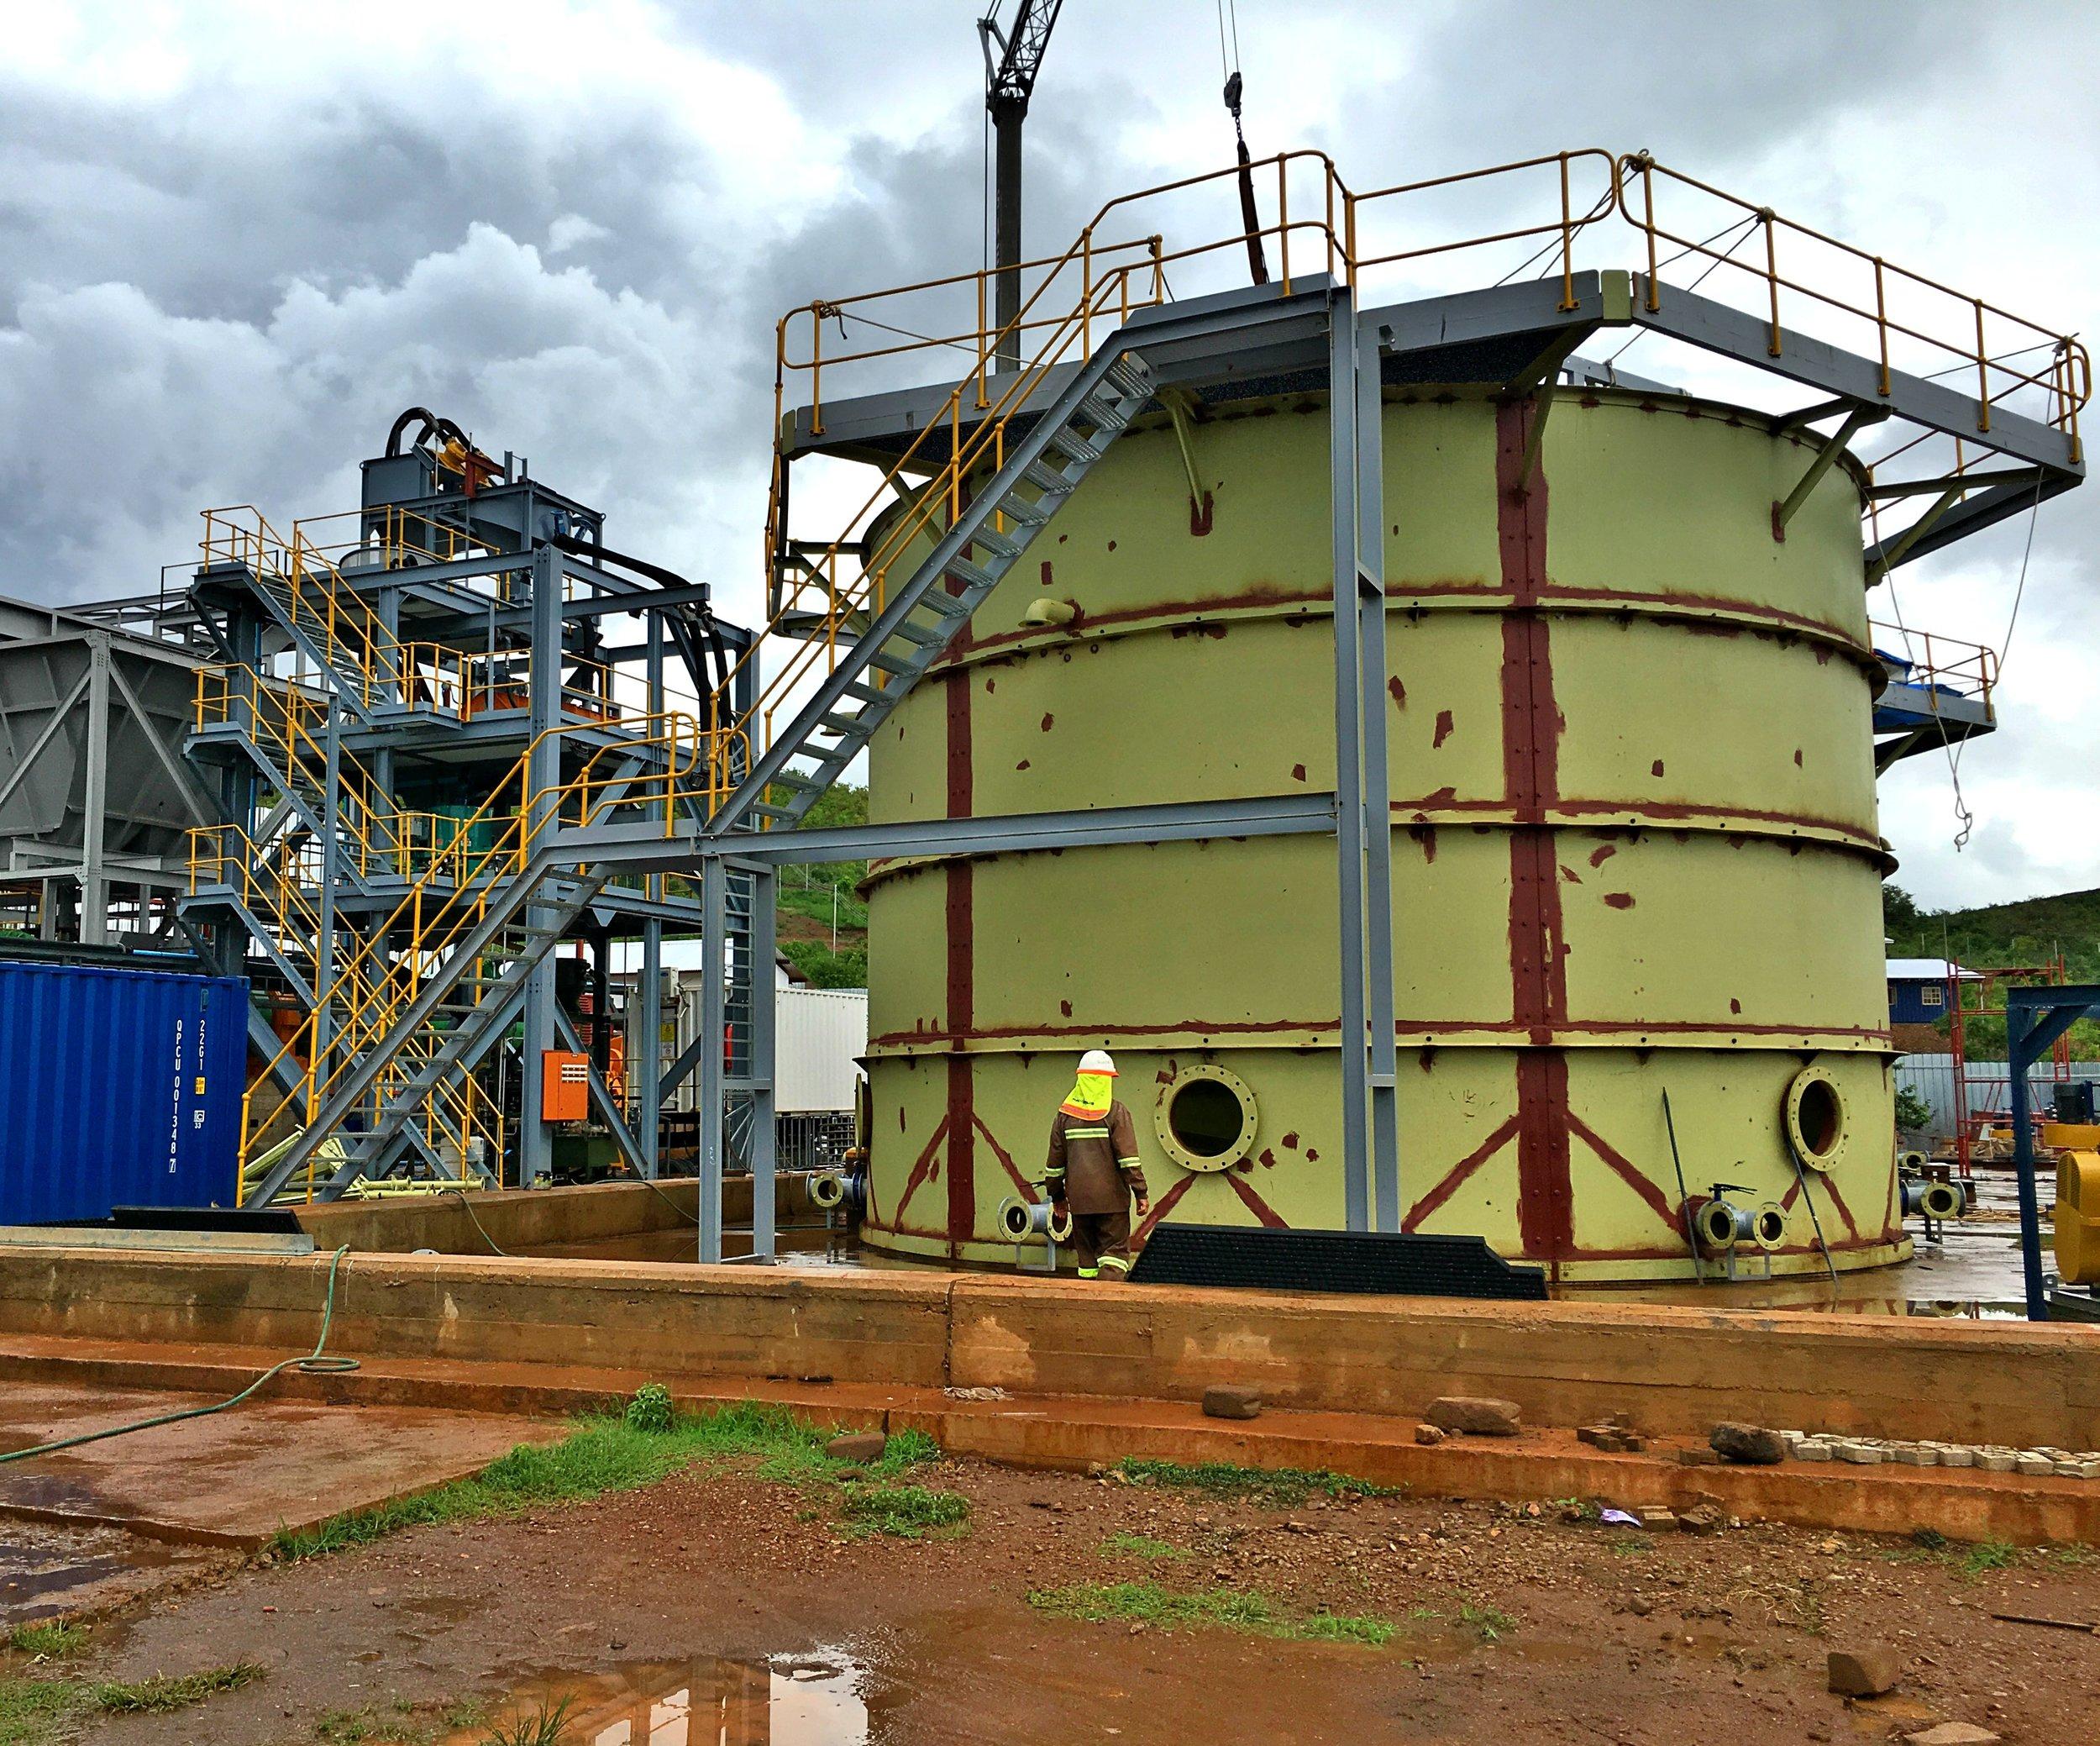 cyanidation mining equipment cata mine tanzania